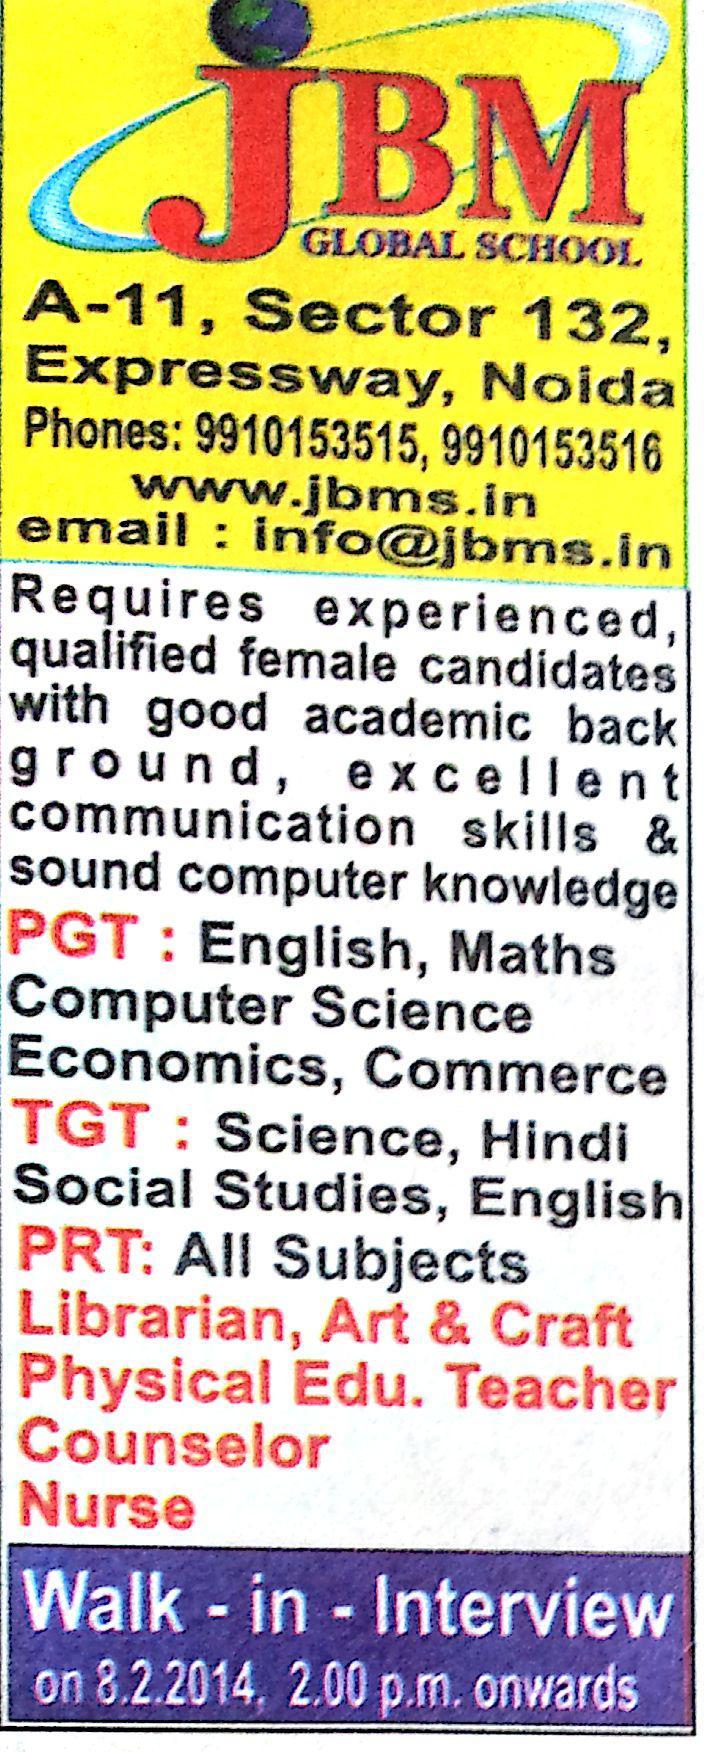 Vacancy for Librarian at JBM Global School, Noida, U.P.